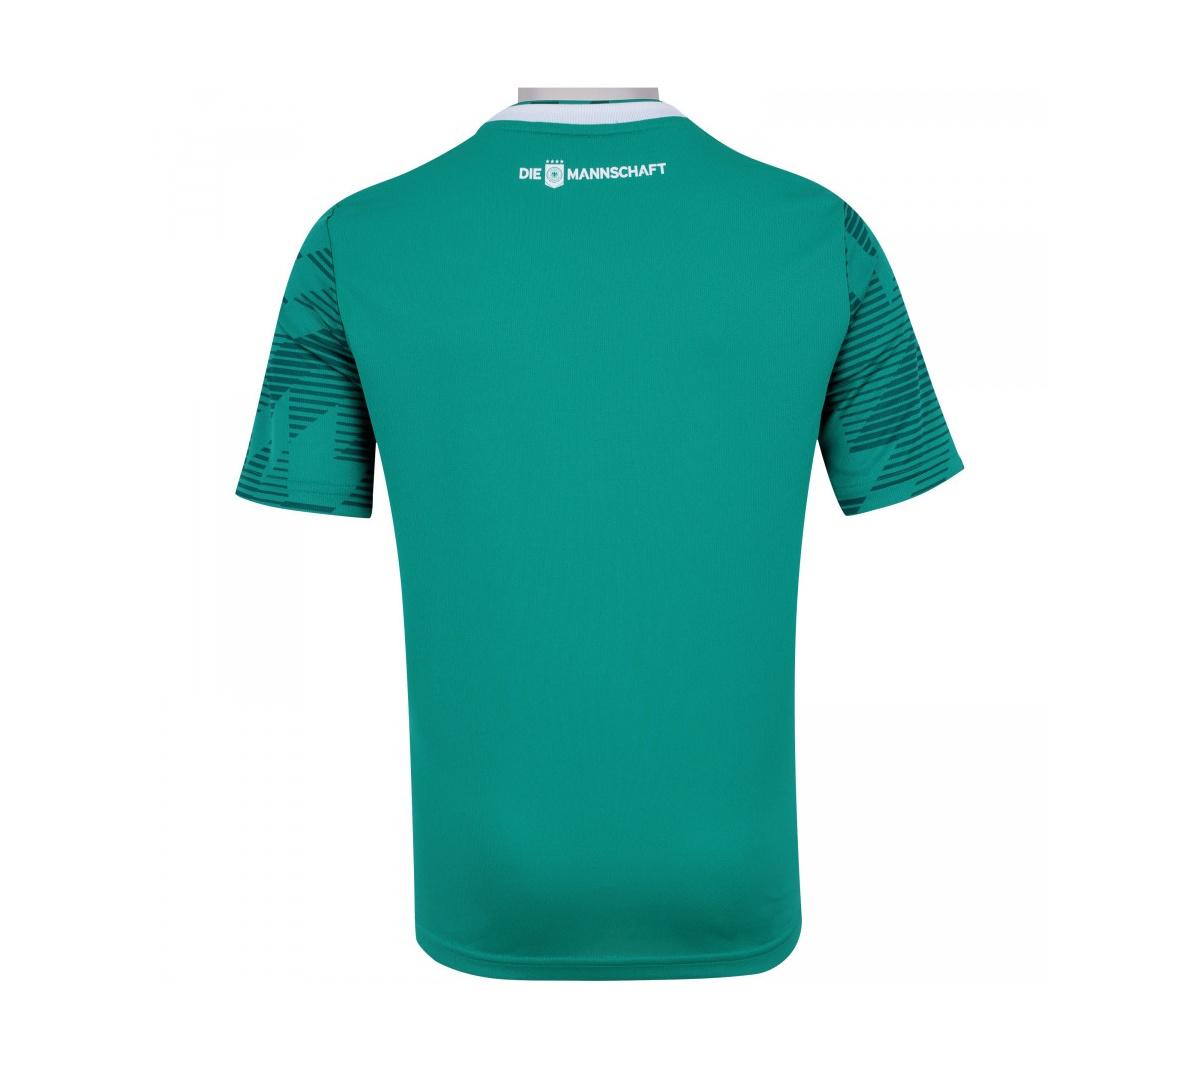 Camisa Adidas Alemanha II Infantil 2018